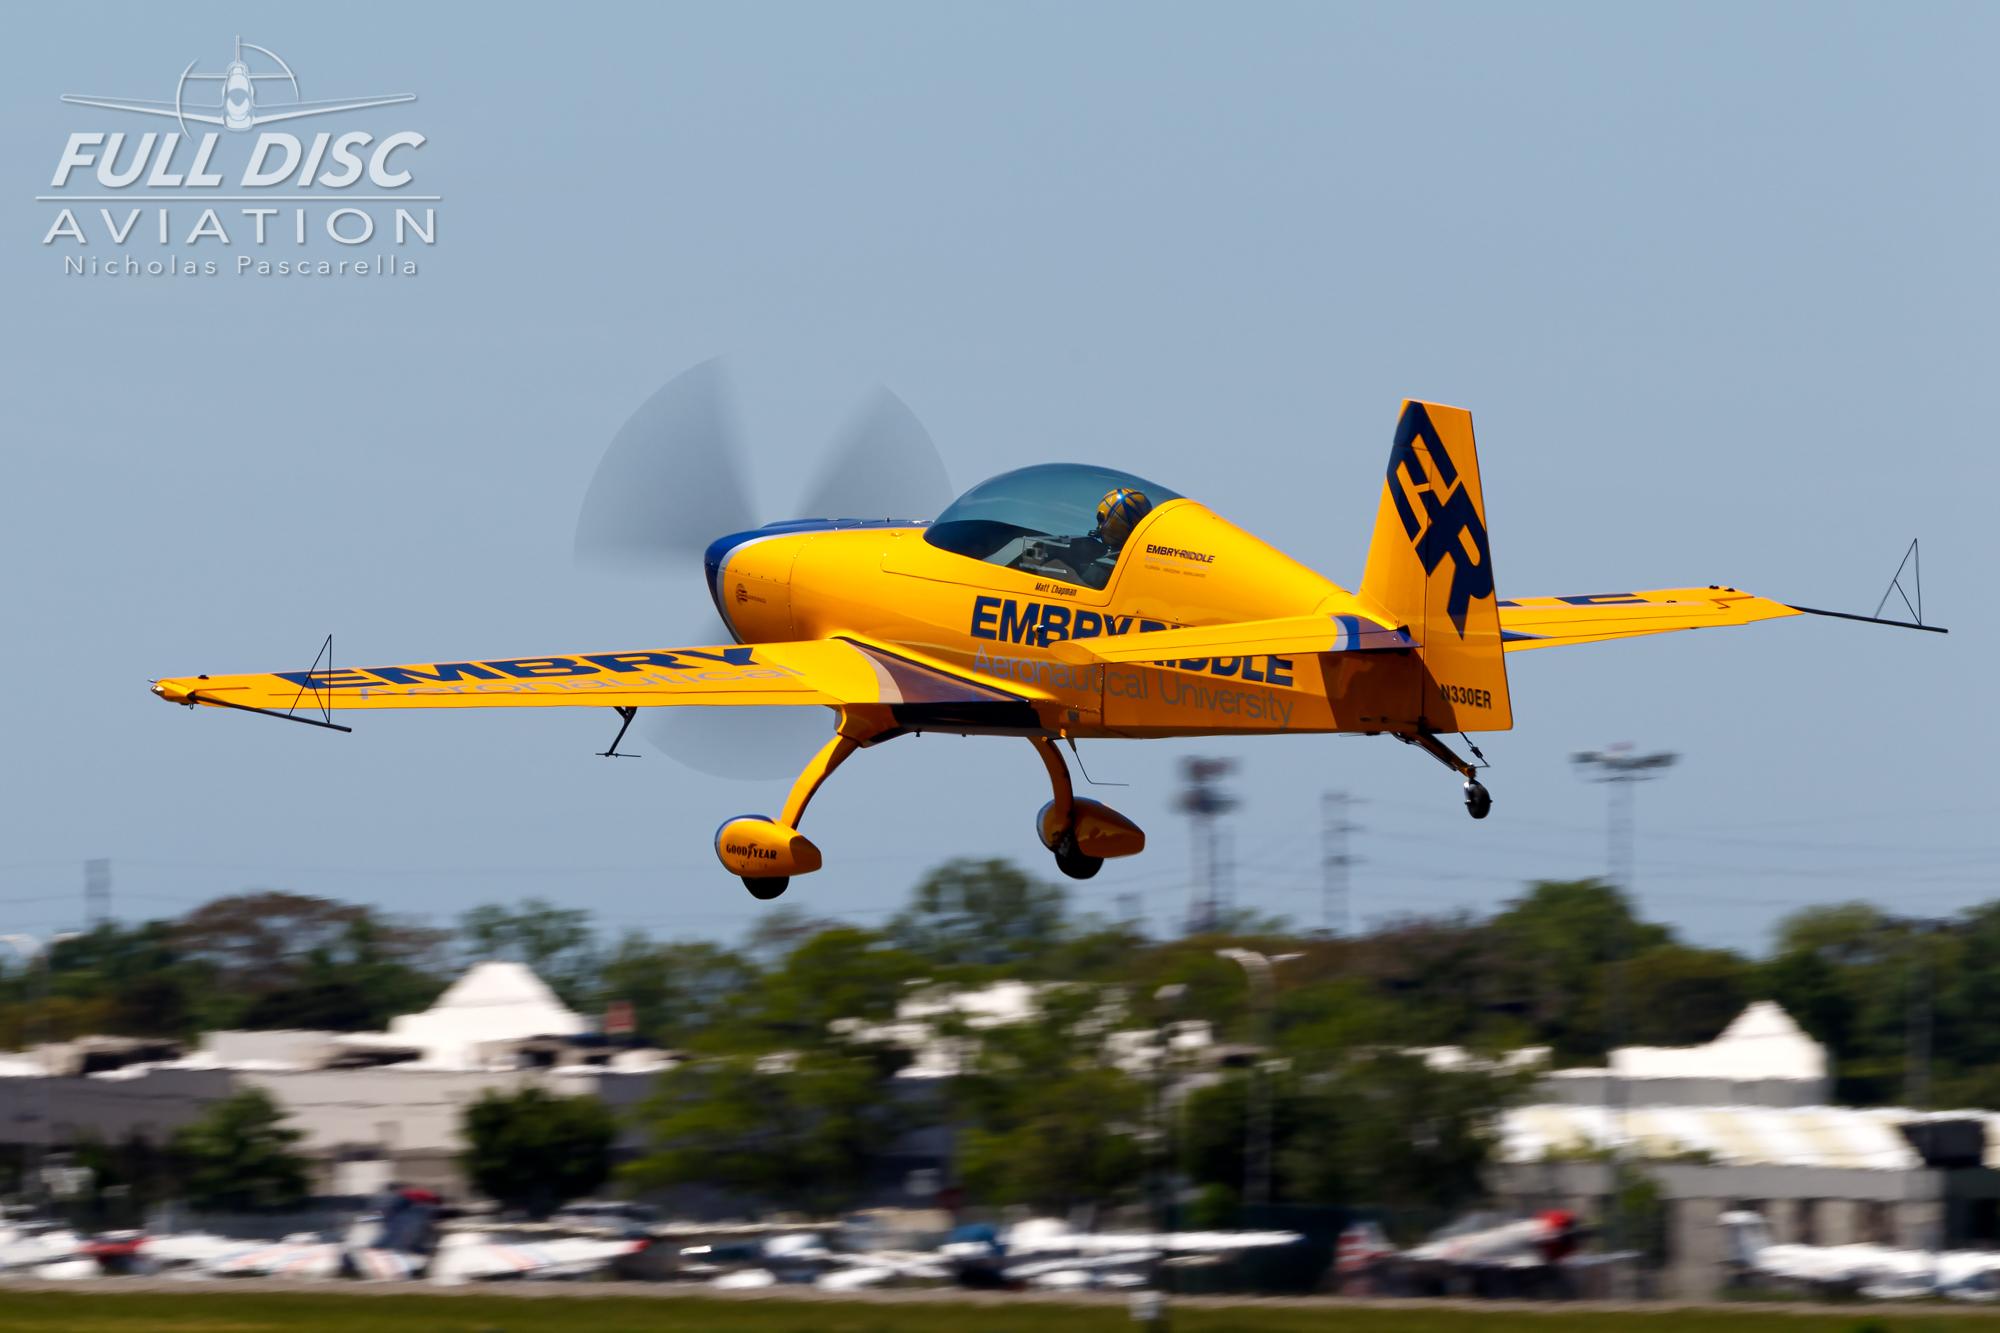 americanairpowermuseum_nicholaspascarella_nickpascarella_fulldiscaviation_legendsofairpower2019_aviation_warbird_mattchapman_landing_stuntplane.jpg